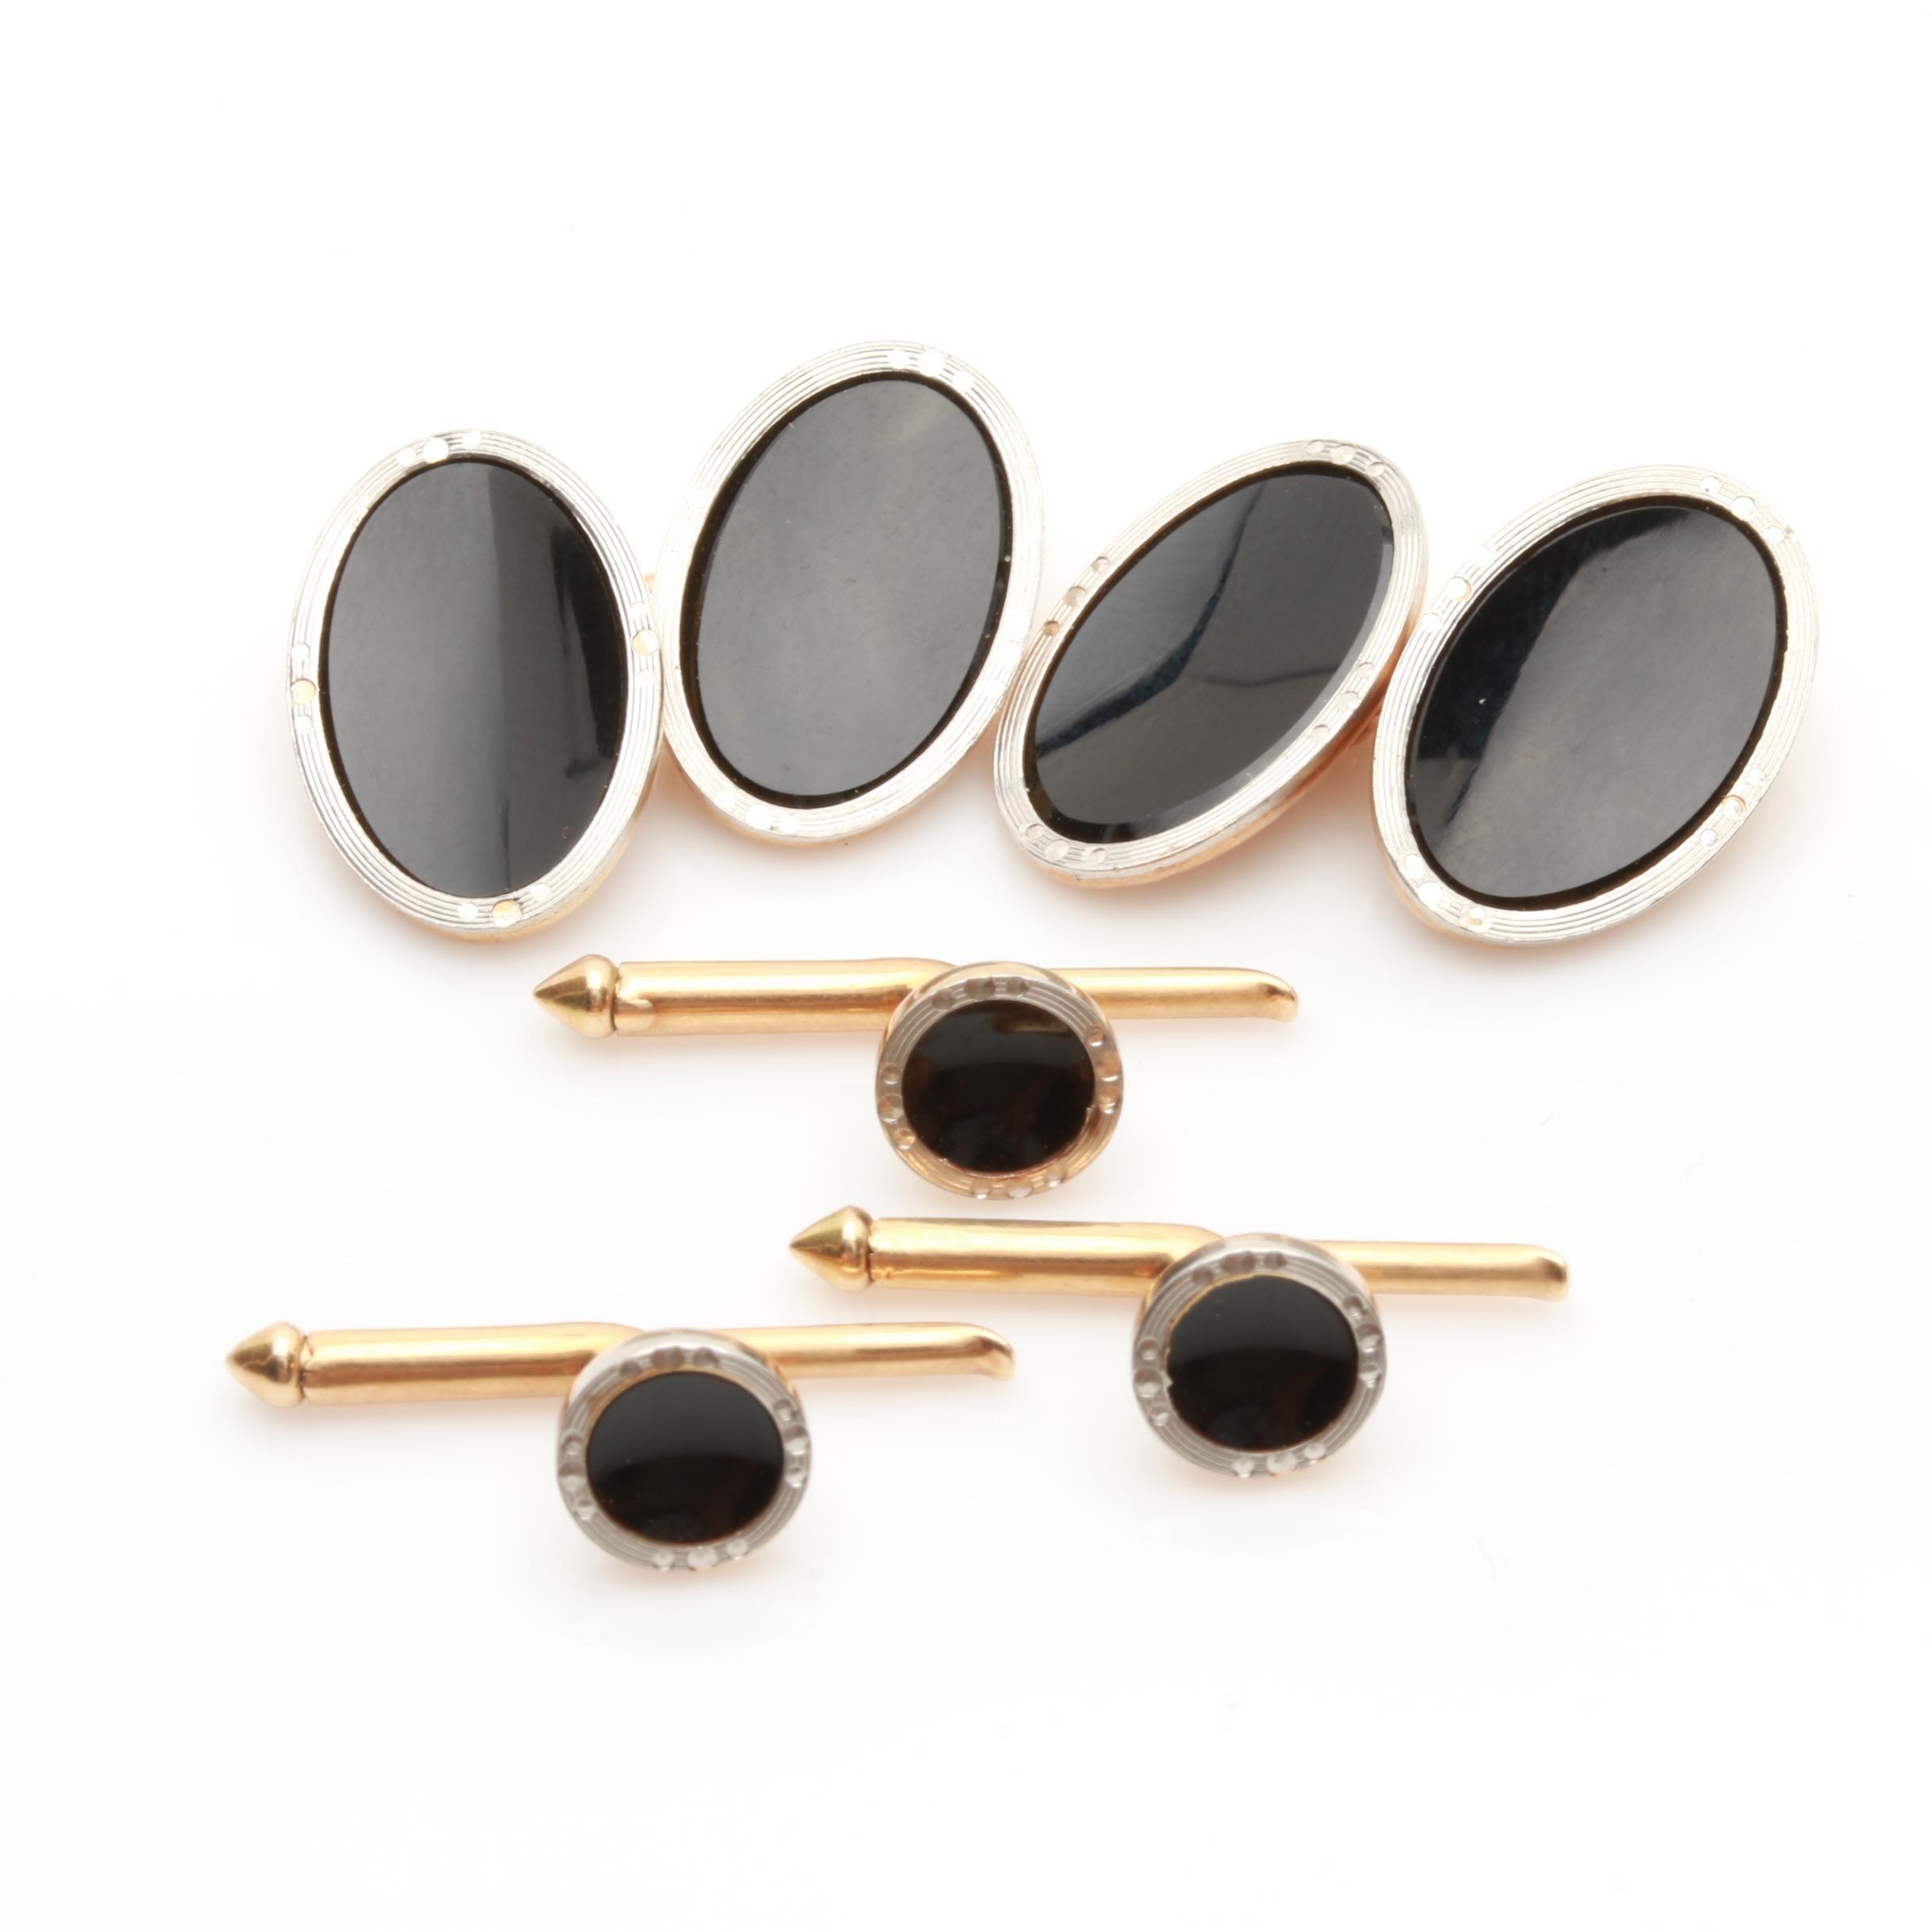 Larter & Sons 14K Yellow Gold and Platinum Black Onyx Cufflinks and Shirt Studs